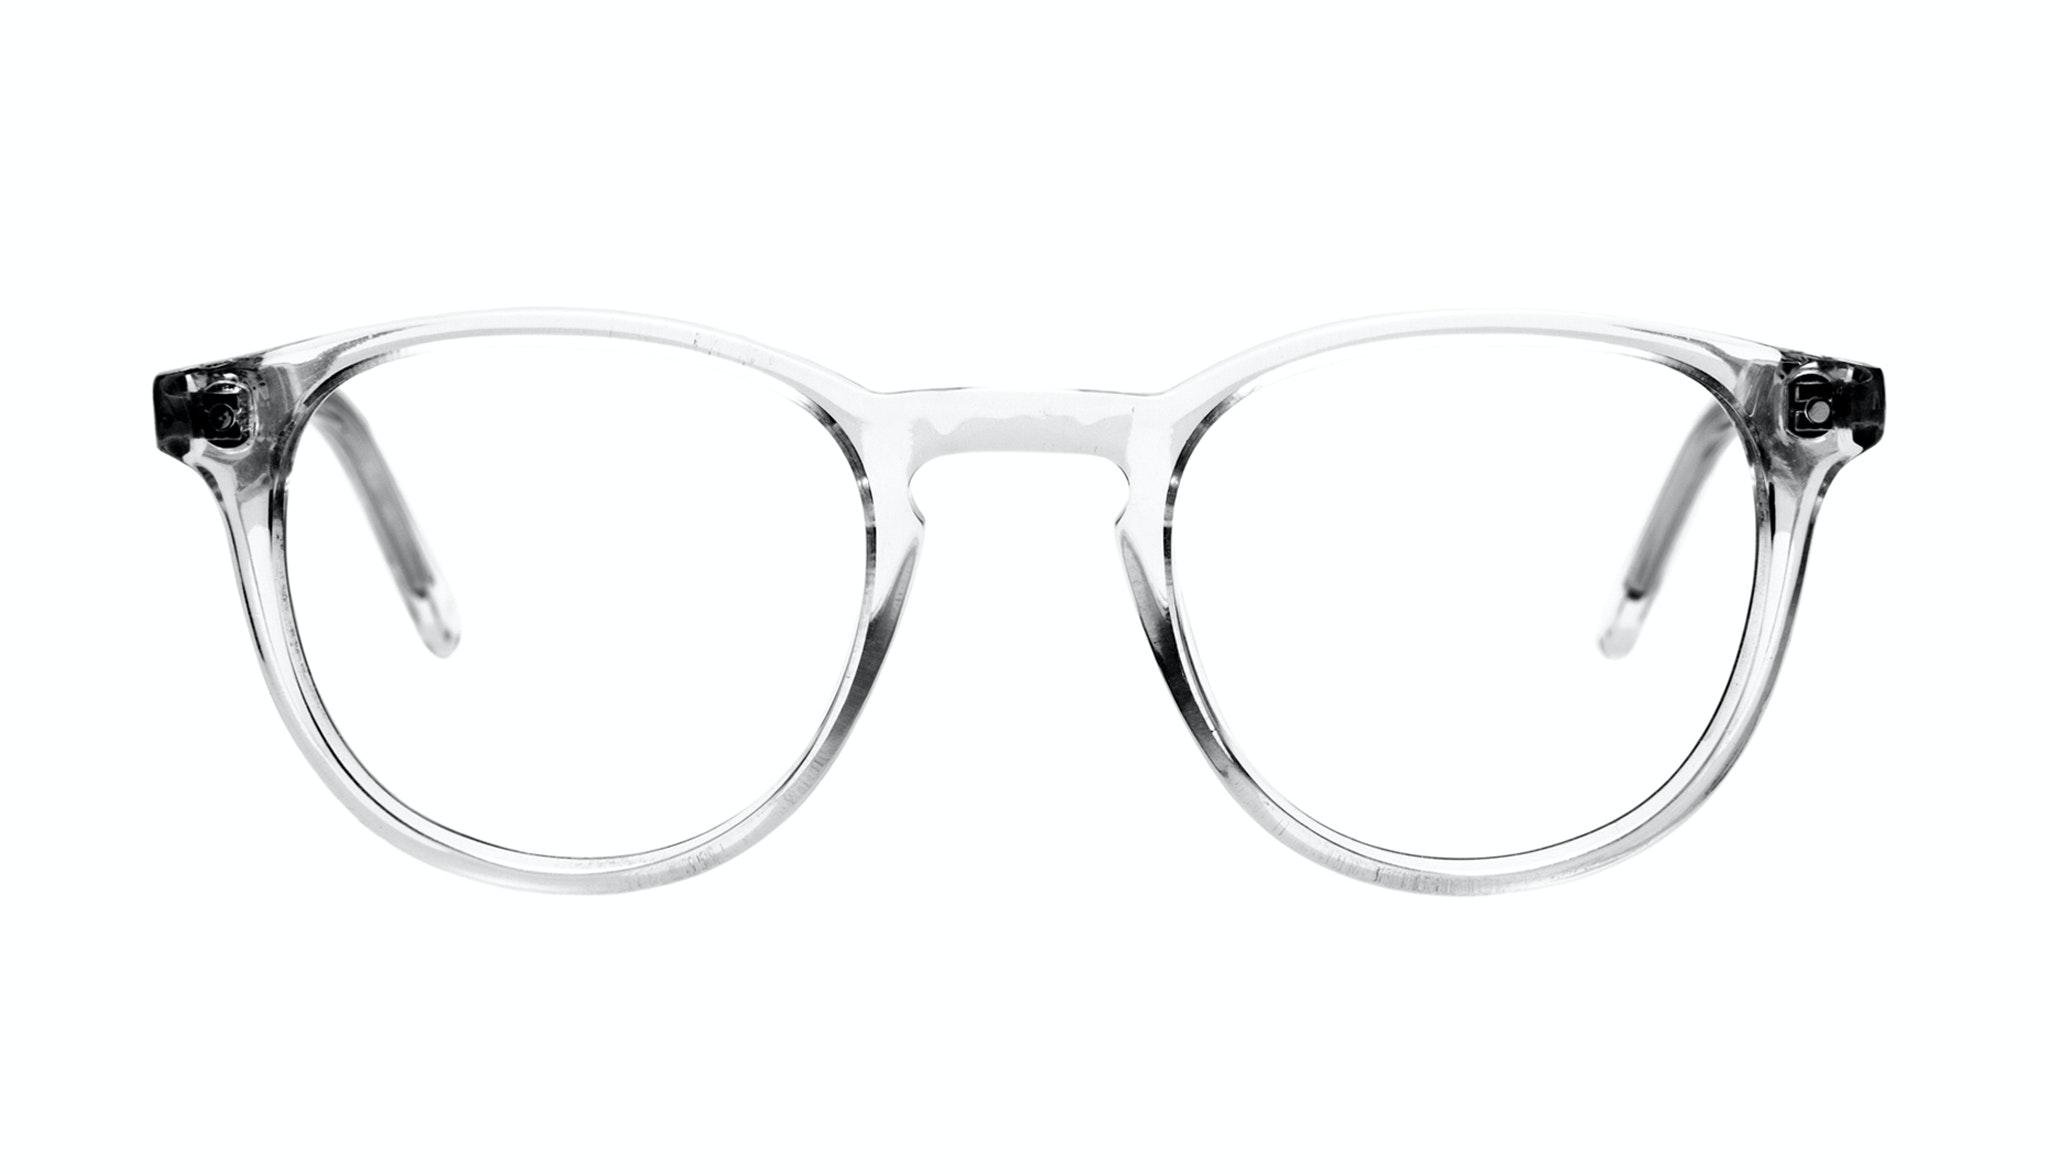 Affordable Fashion Glasses Round Eyeglasses Men Cult Diamond